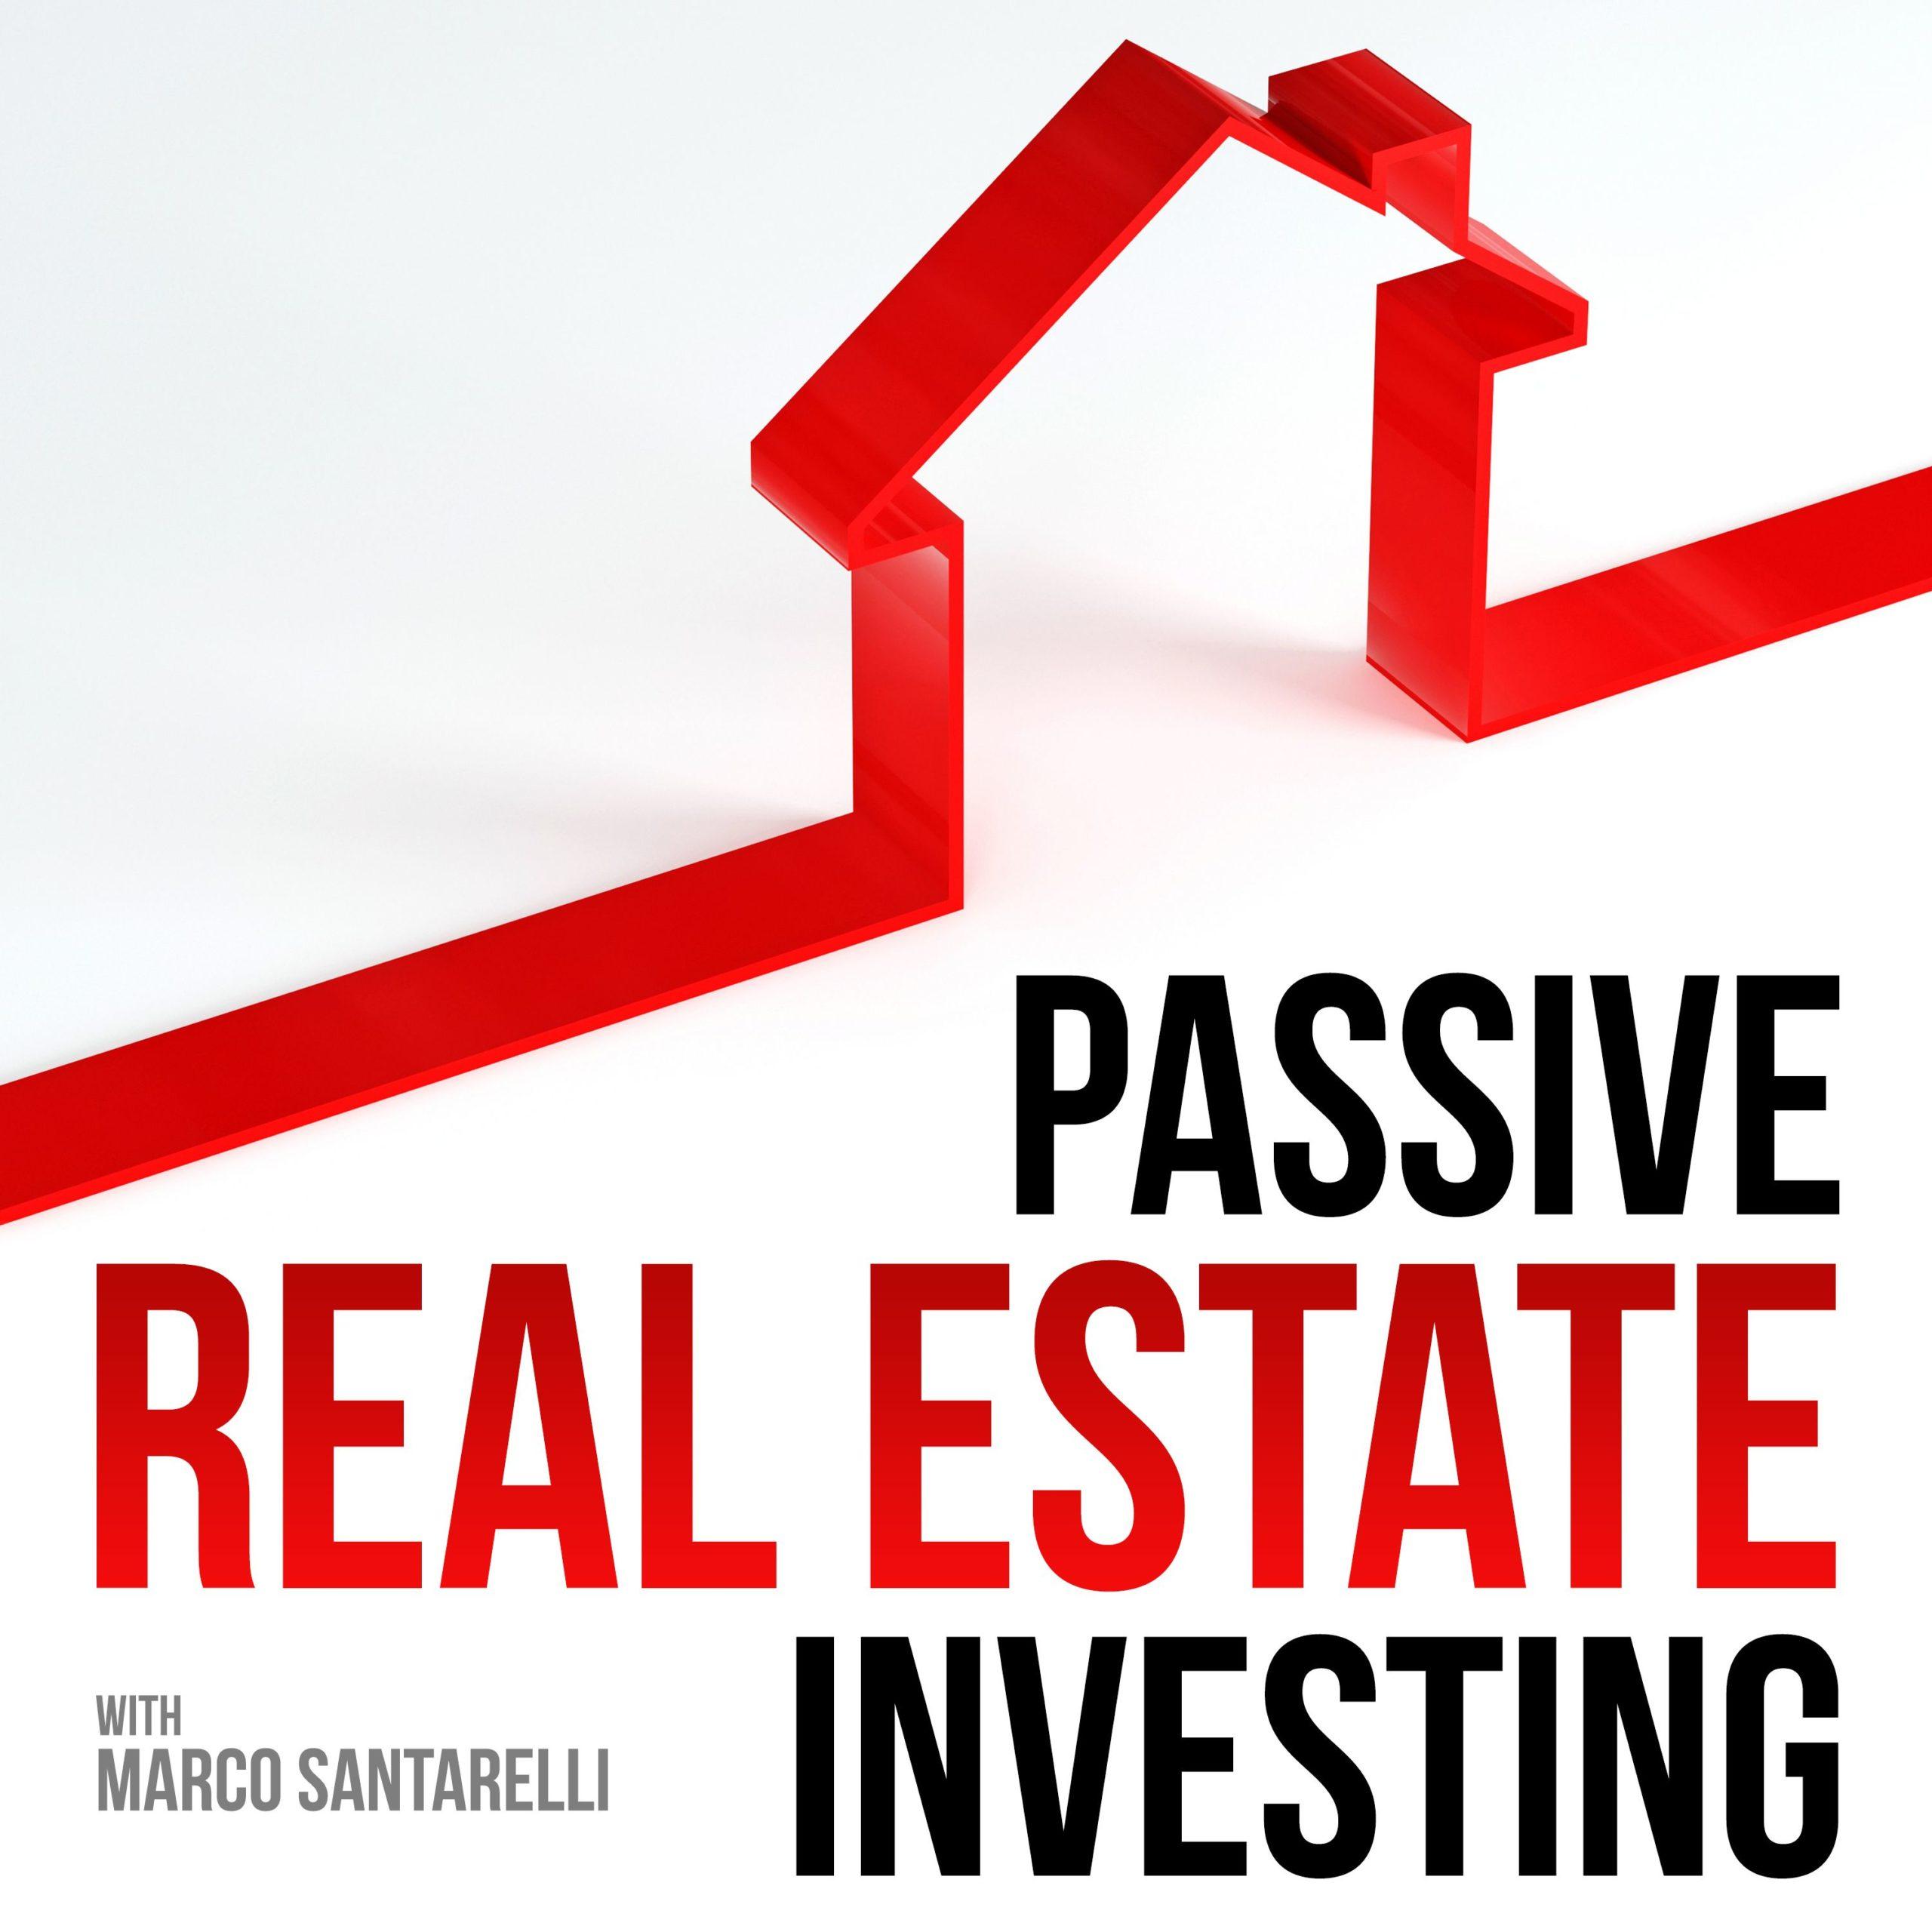 Passve Real Estate Investing Podcast Logo